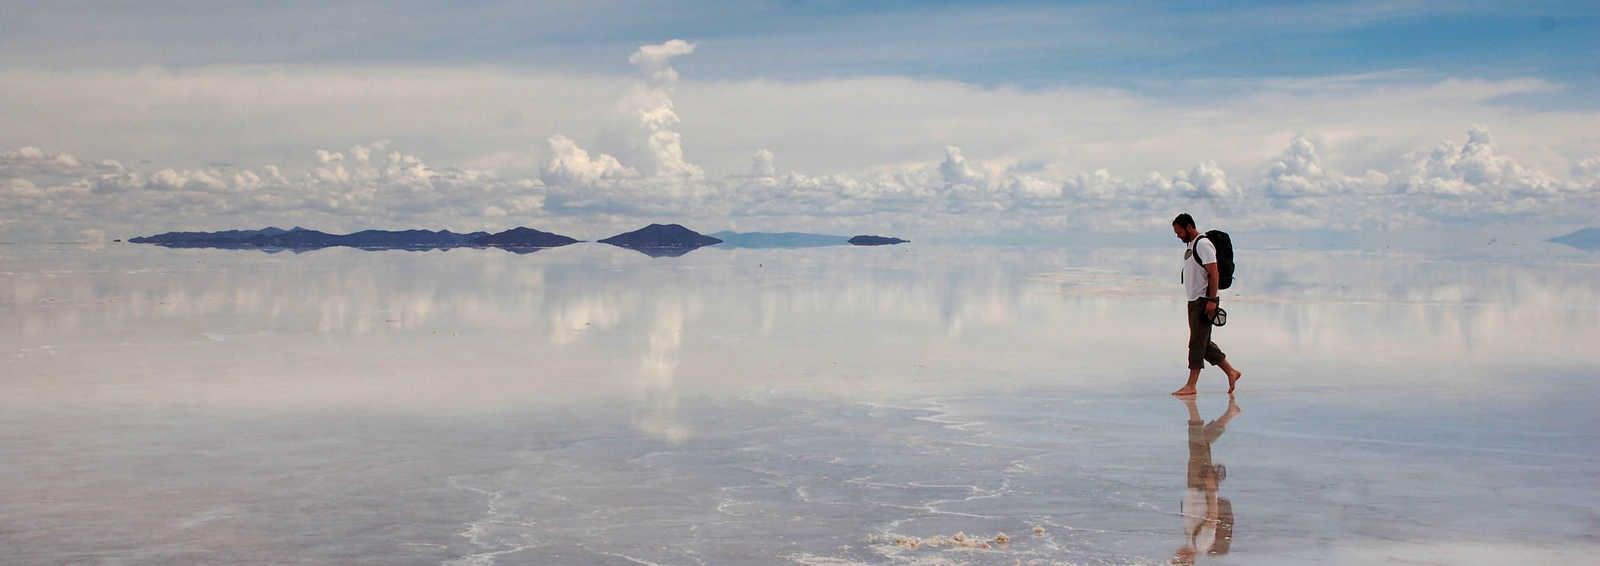 Uyuni Salt Flats, Bolivia